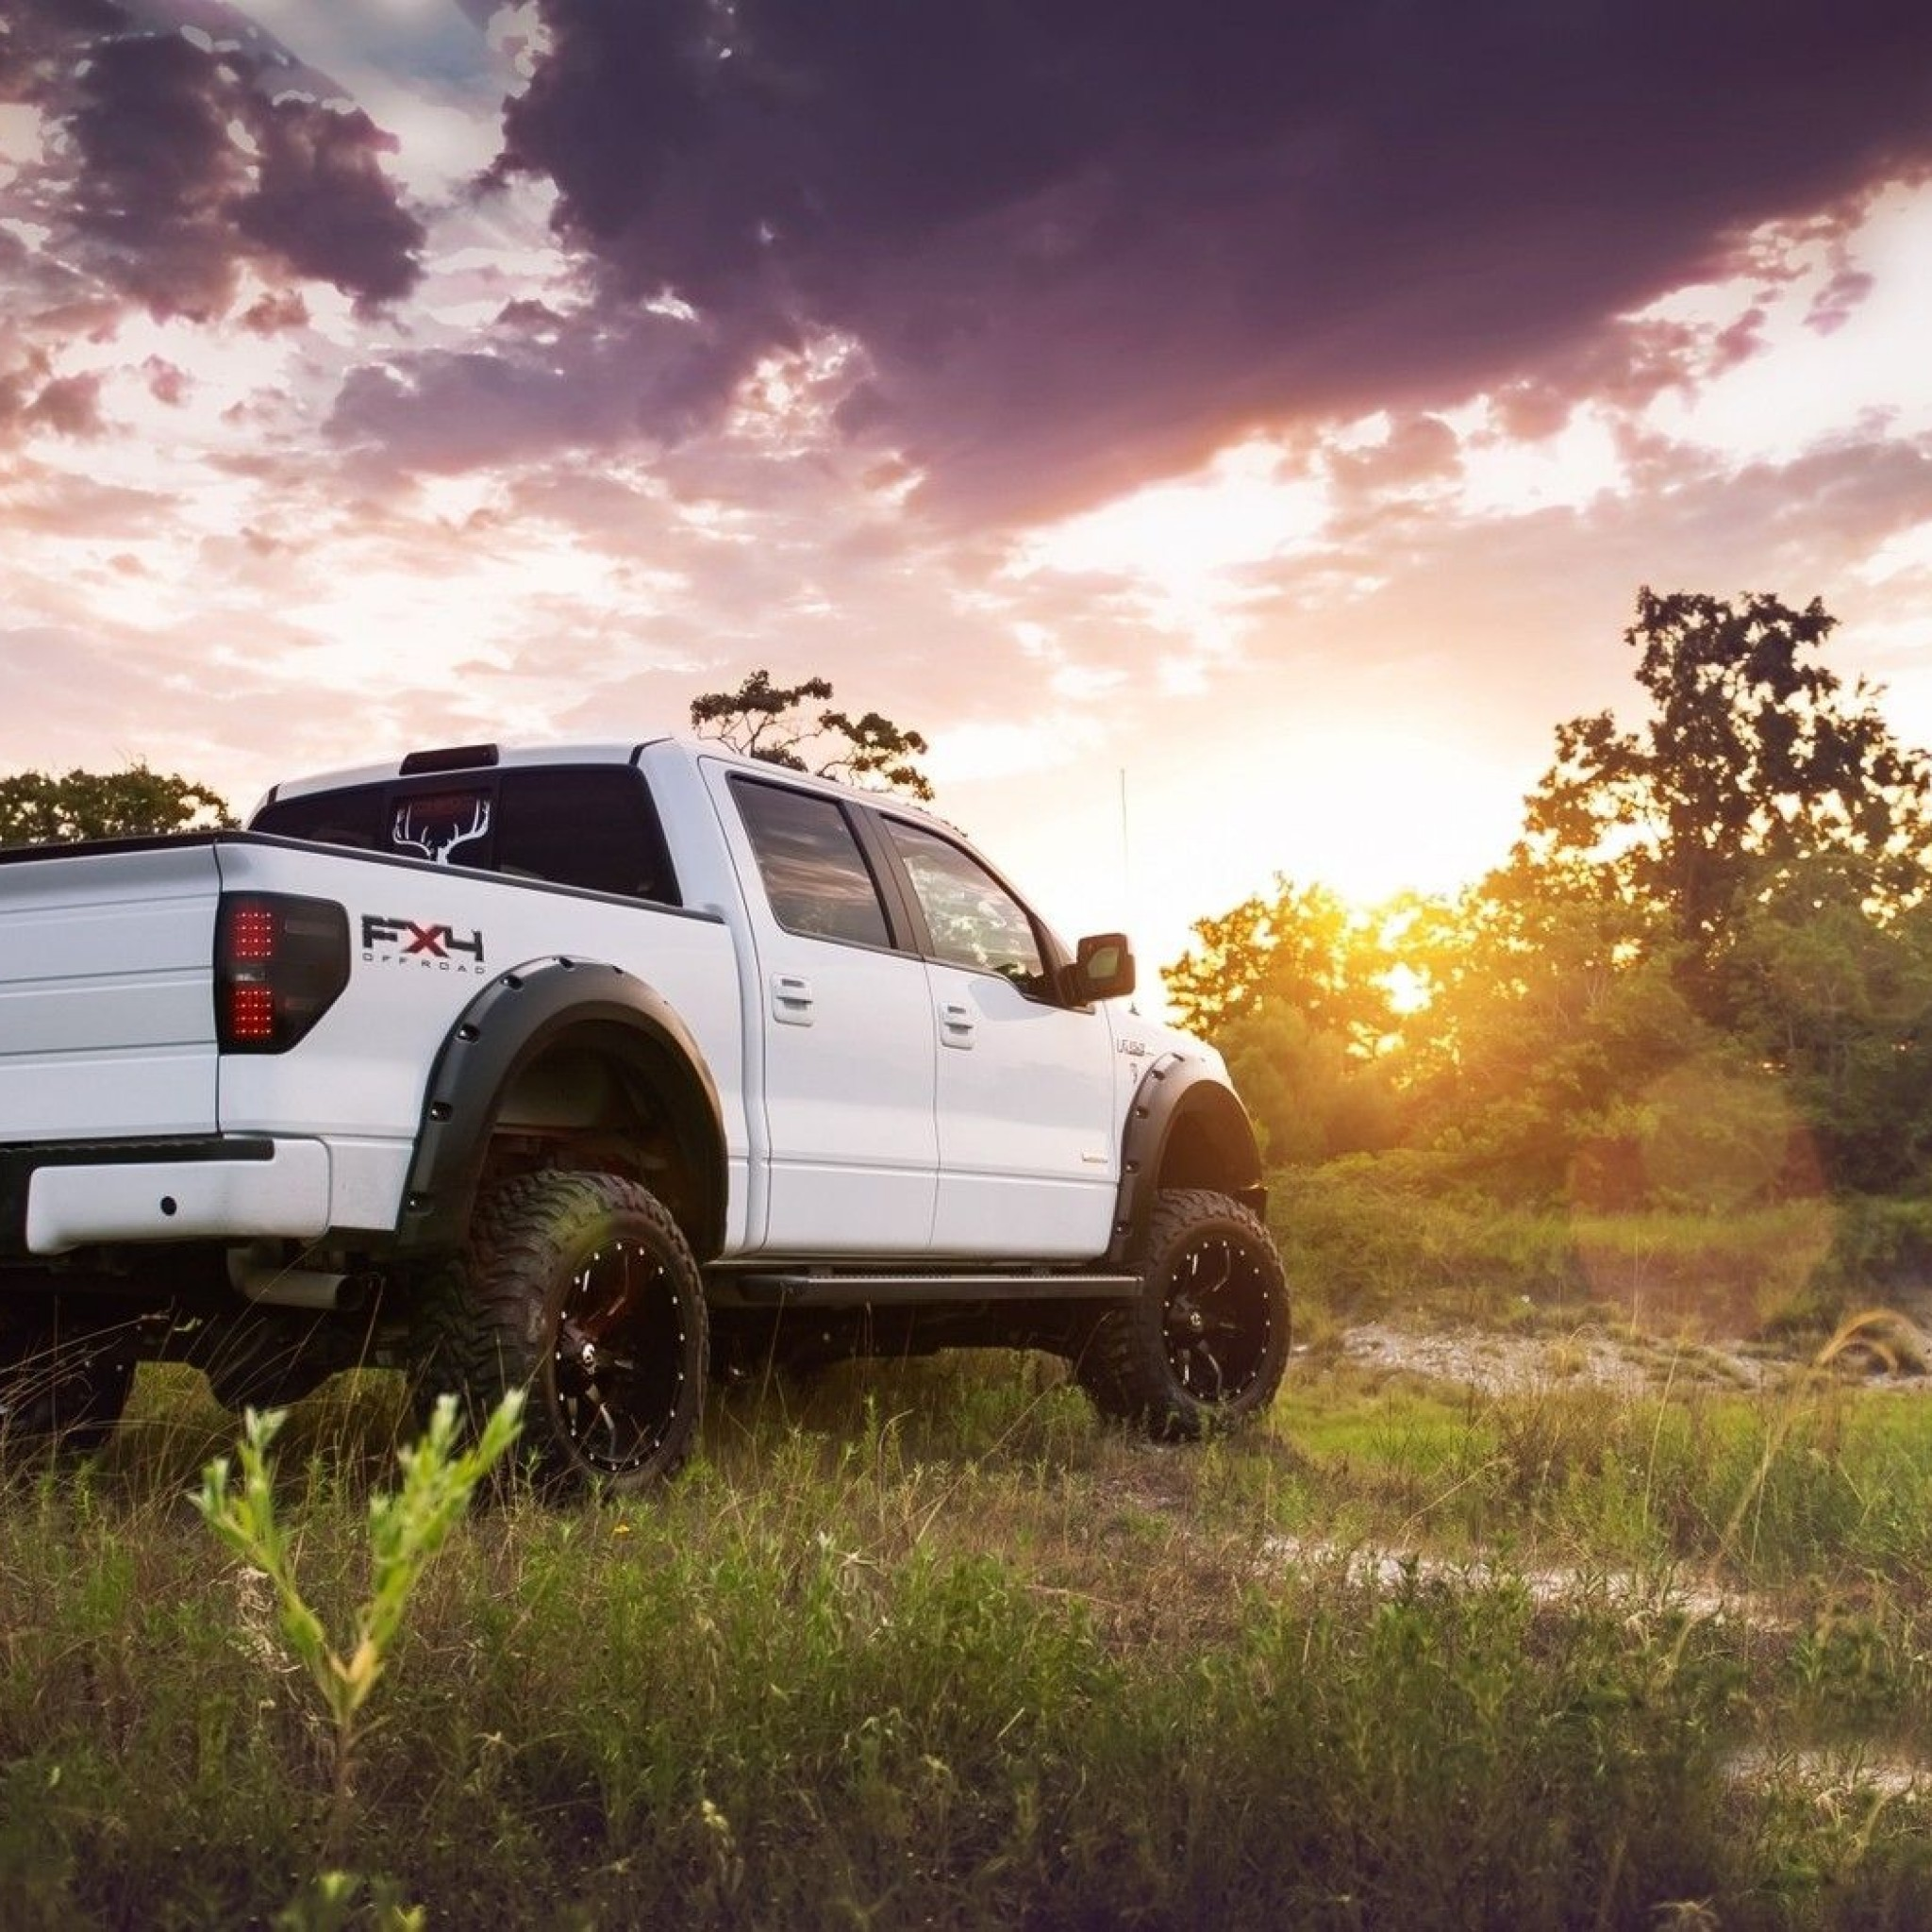 ford truck iphone wallpaper desktop